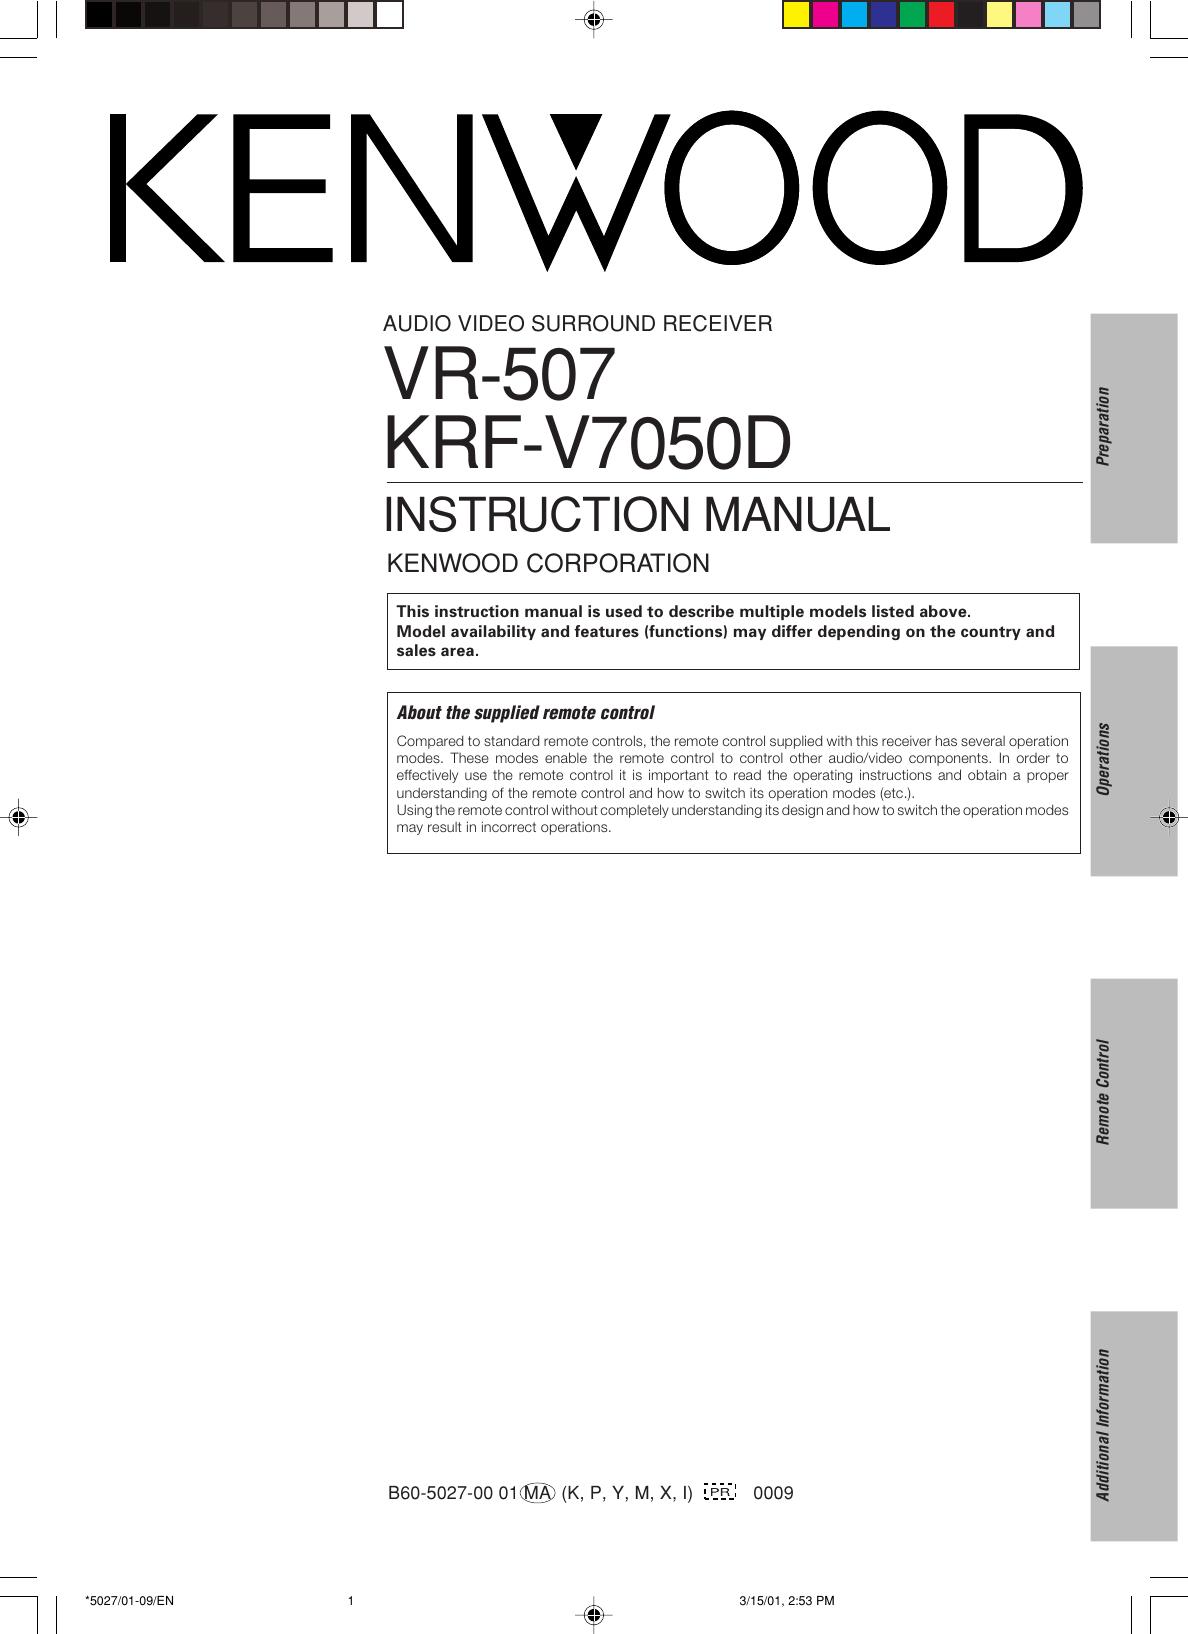 Kenwood 5 1 Krf V7050d Users Manual 5027 01 09 En Stereo Wiring Diagram For Surround Sound